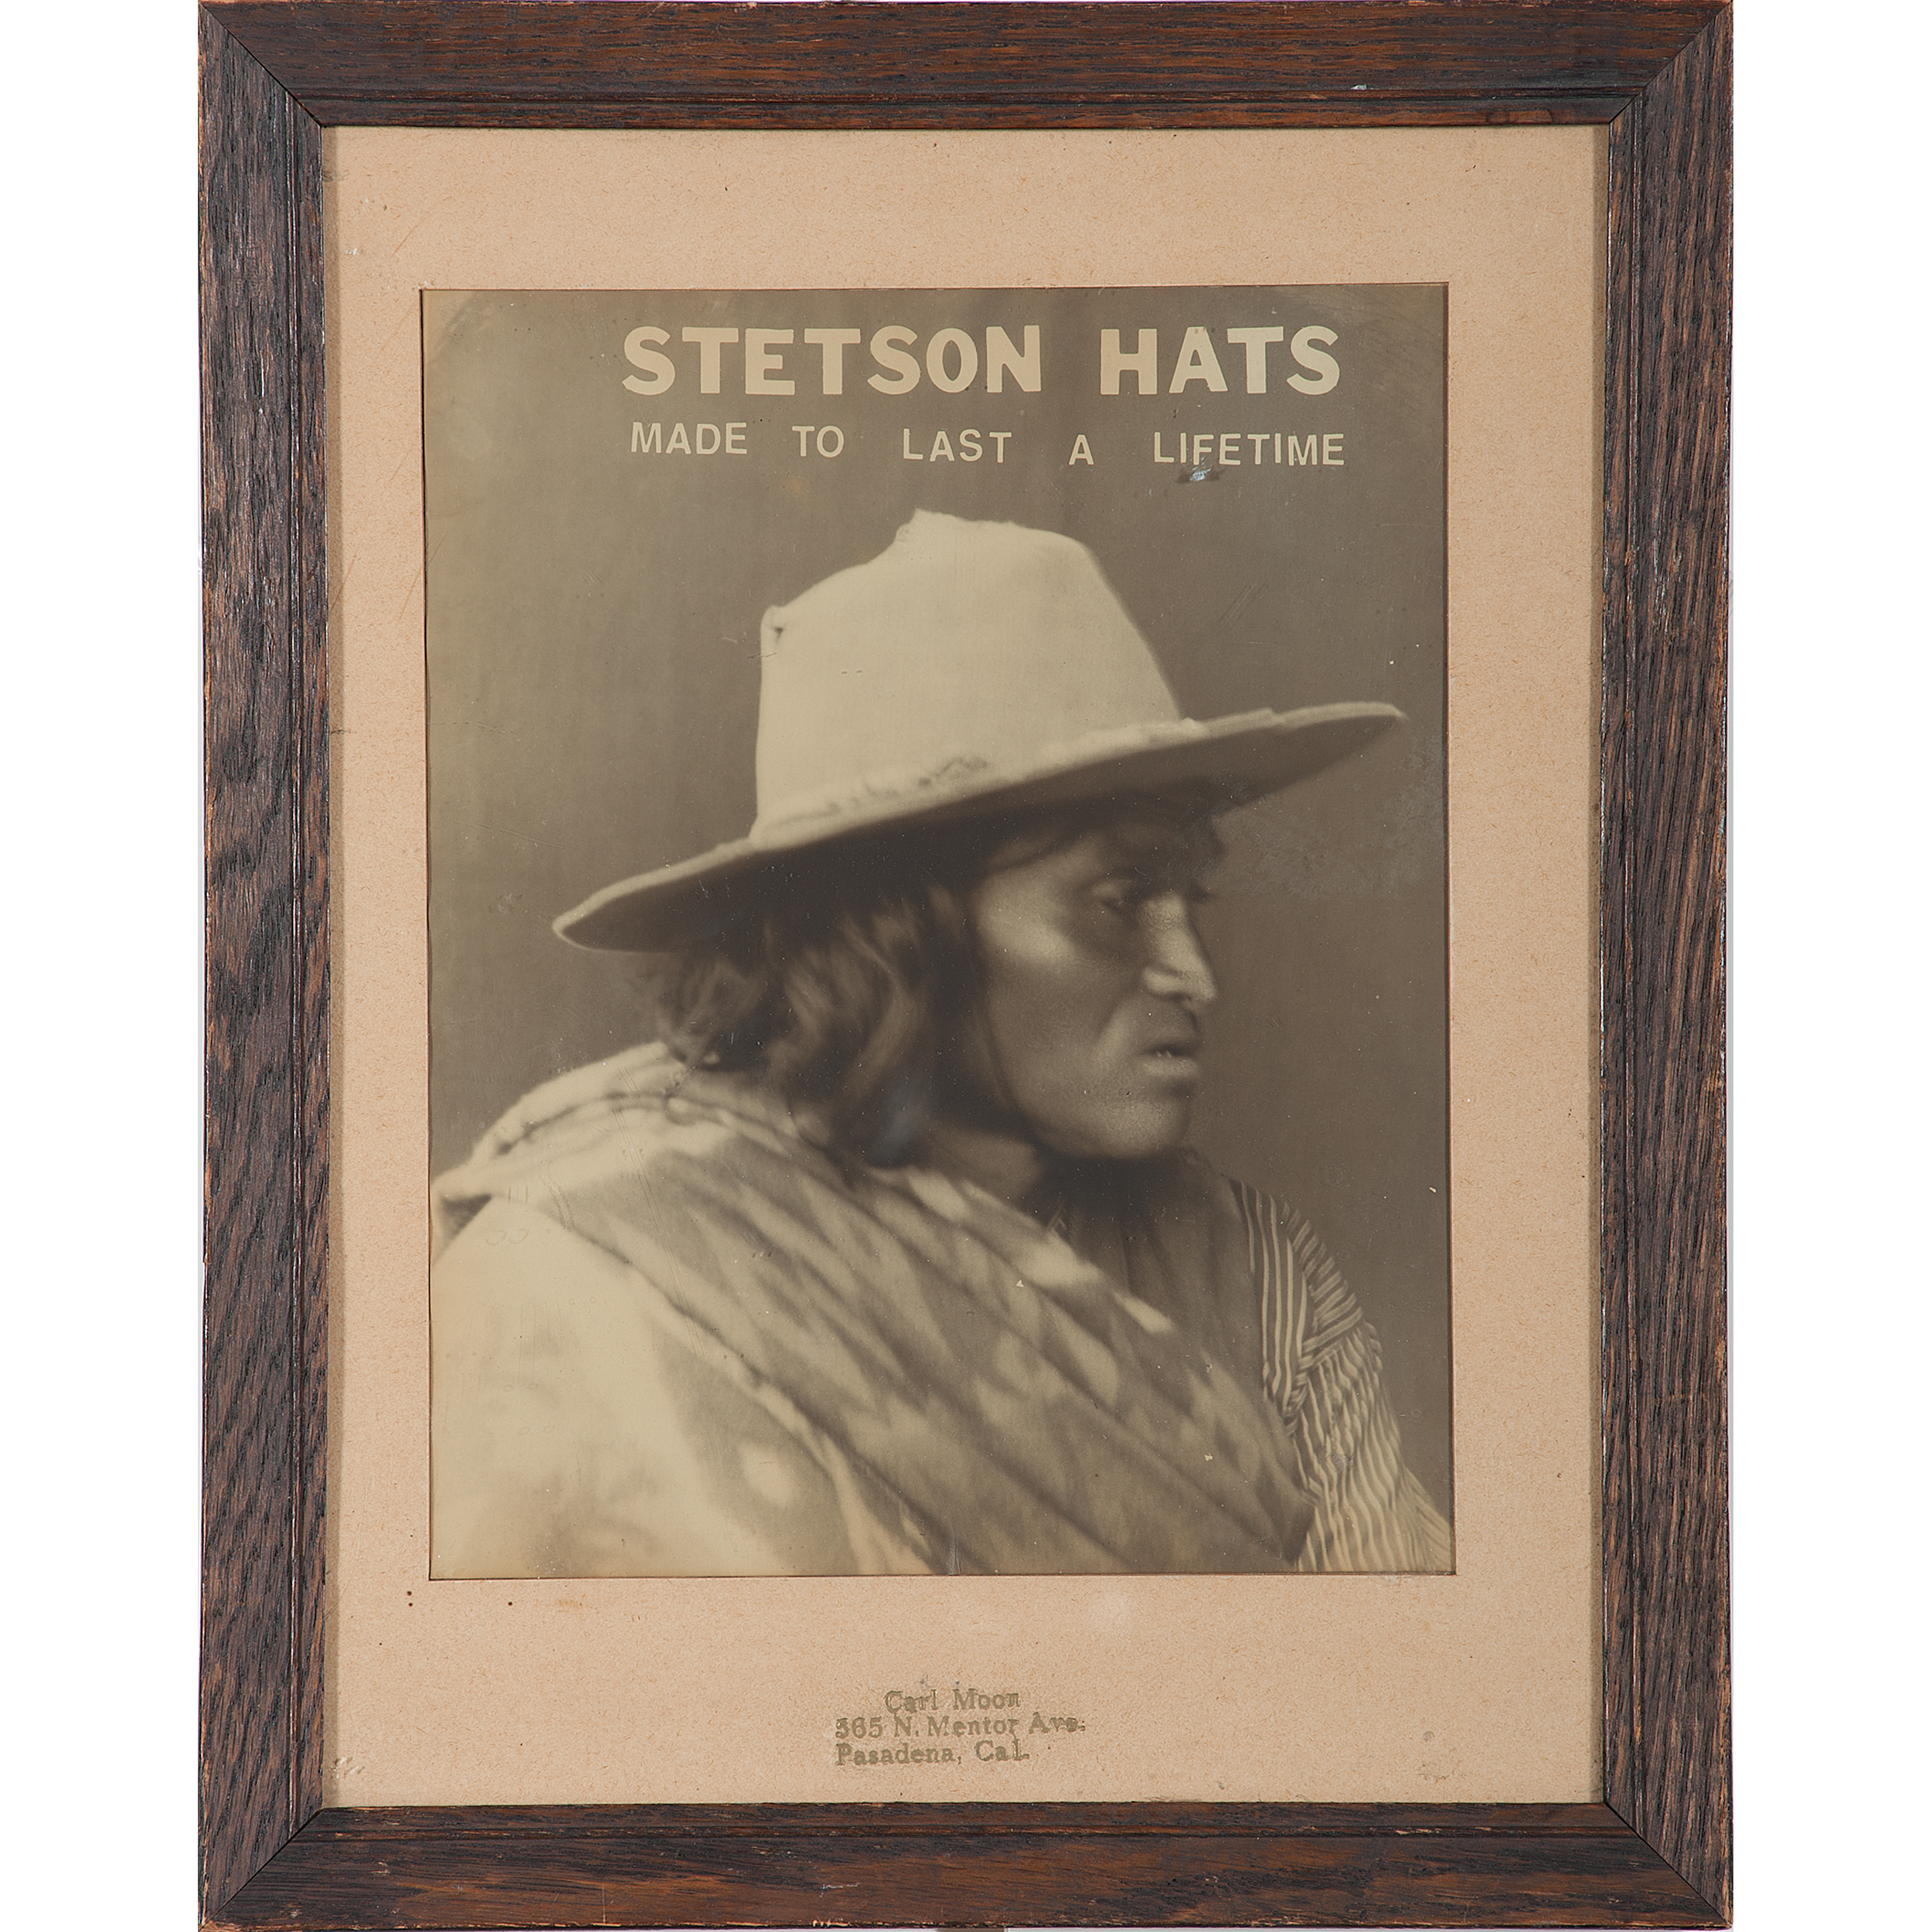 Carl Moon Photographic Advertisement for Stetson Hats  f2c97e11c9e2